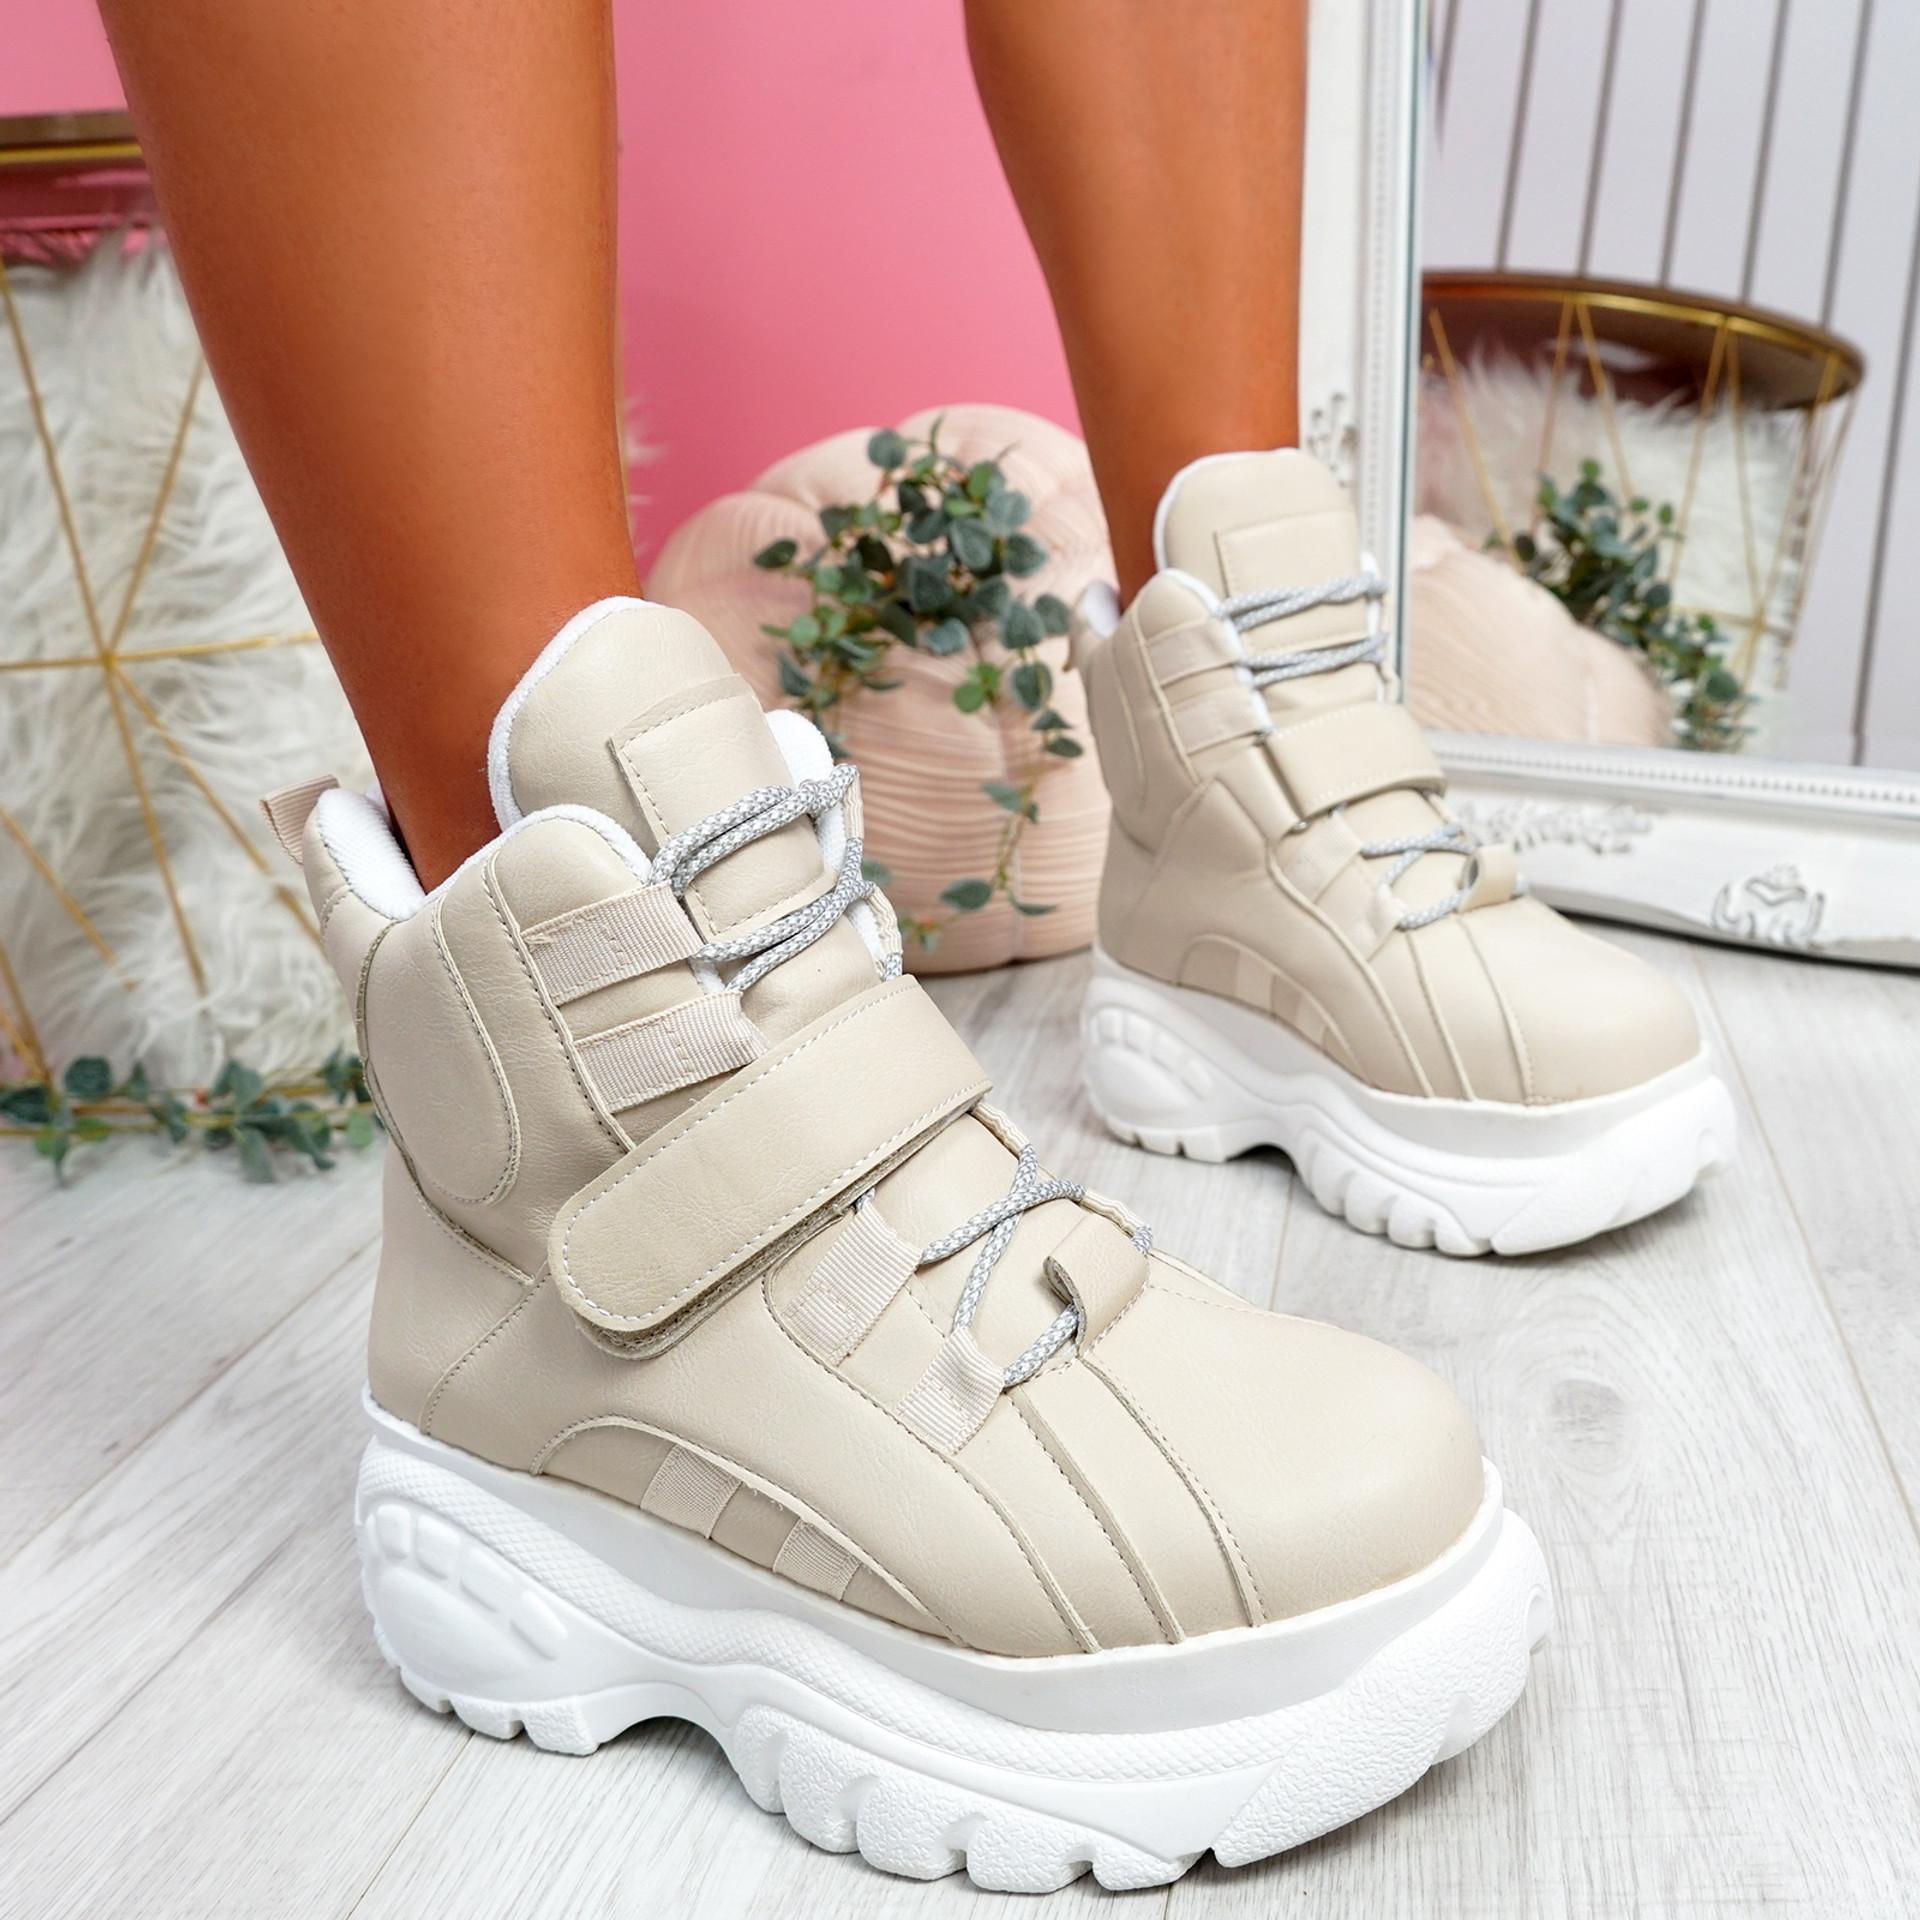 Guffe Beige Flatform Ankle Boots